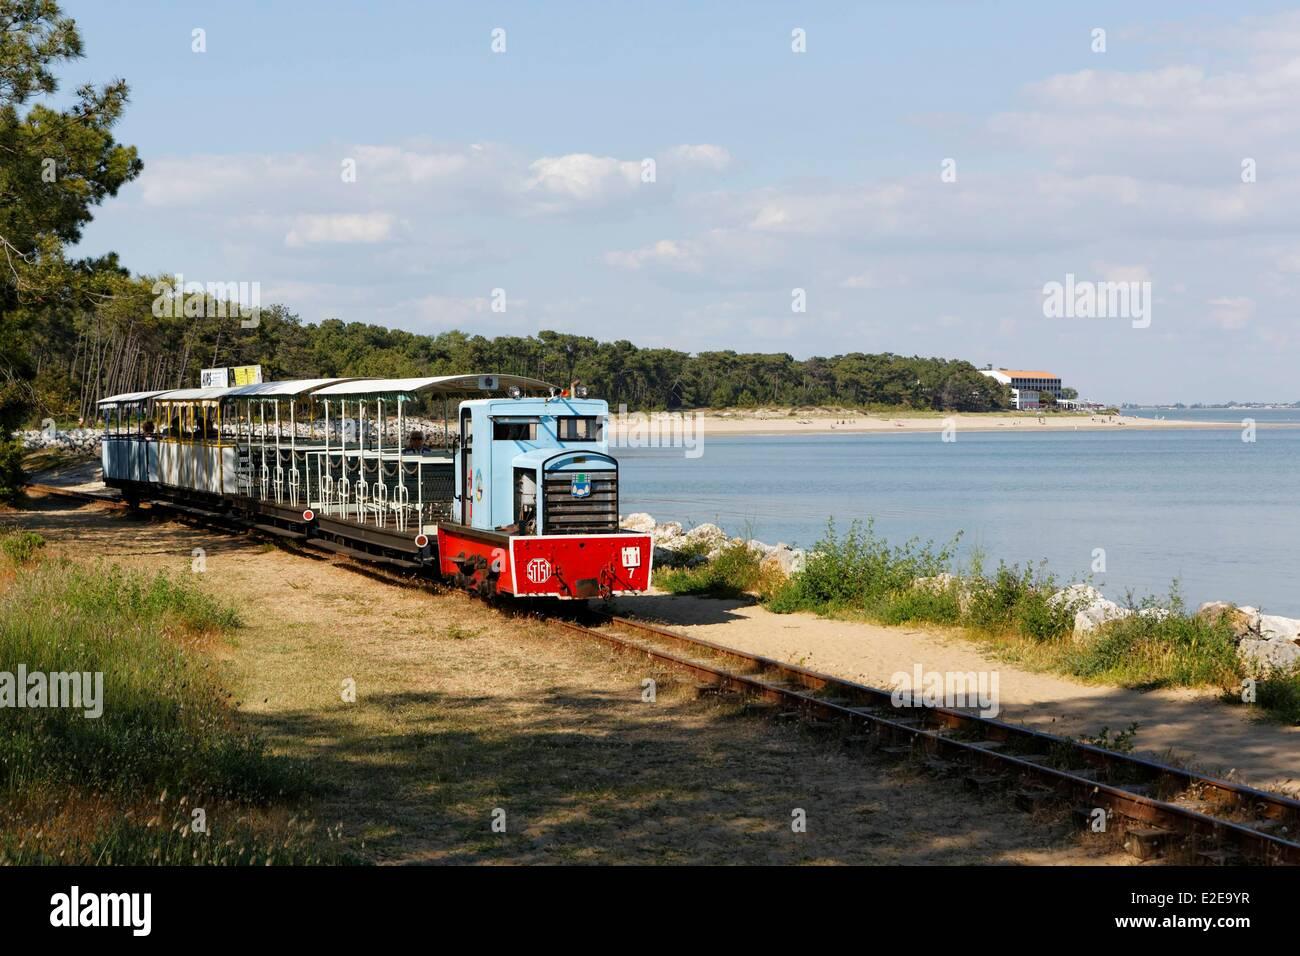 France, Charente Maritime, Ile d'Oleron, Pointe de Maumusson, small train of Saint-Trojan-Les-Bains - Stock Image